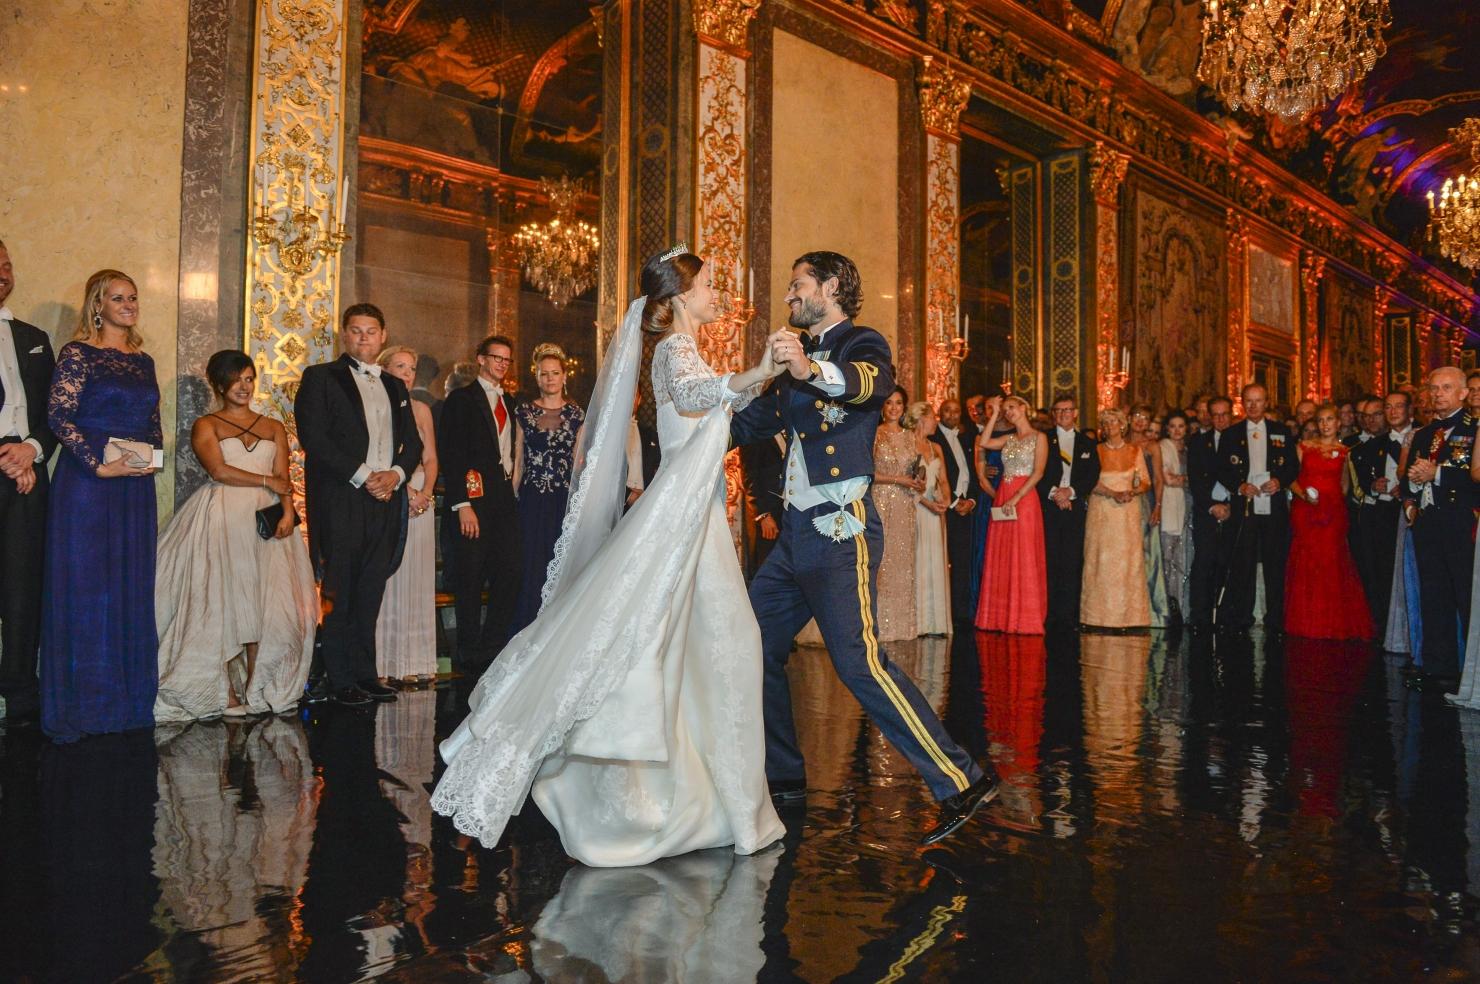 Prințul Carl Filip al Suediei